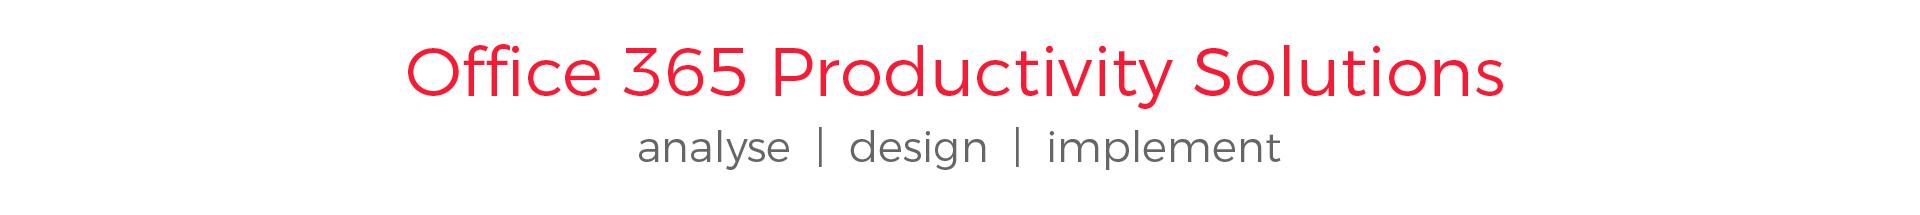 Office365 productivity with Applecart Digital